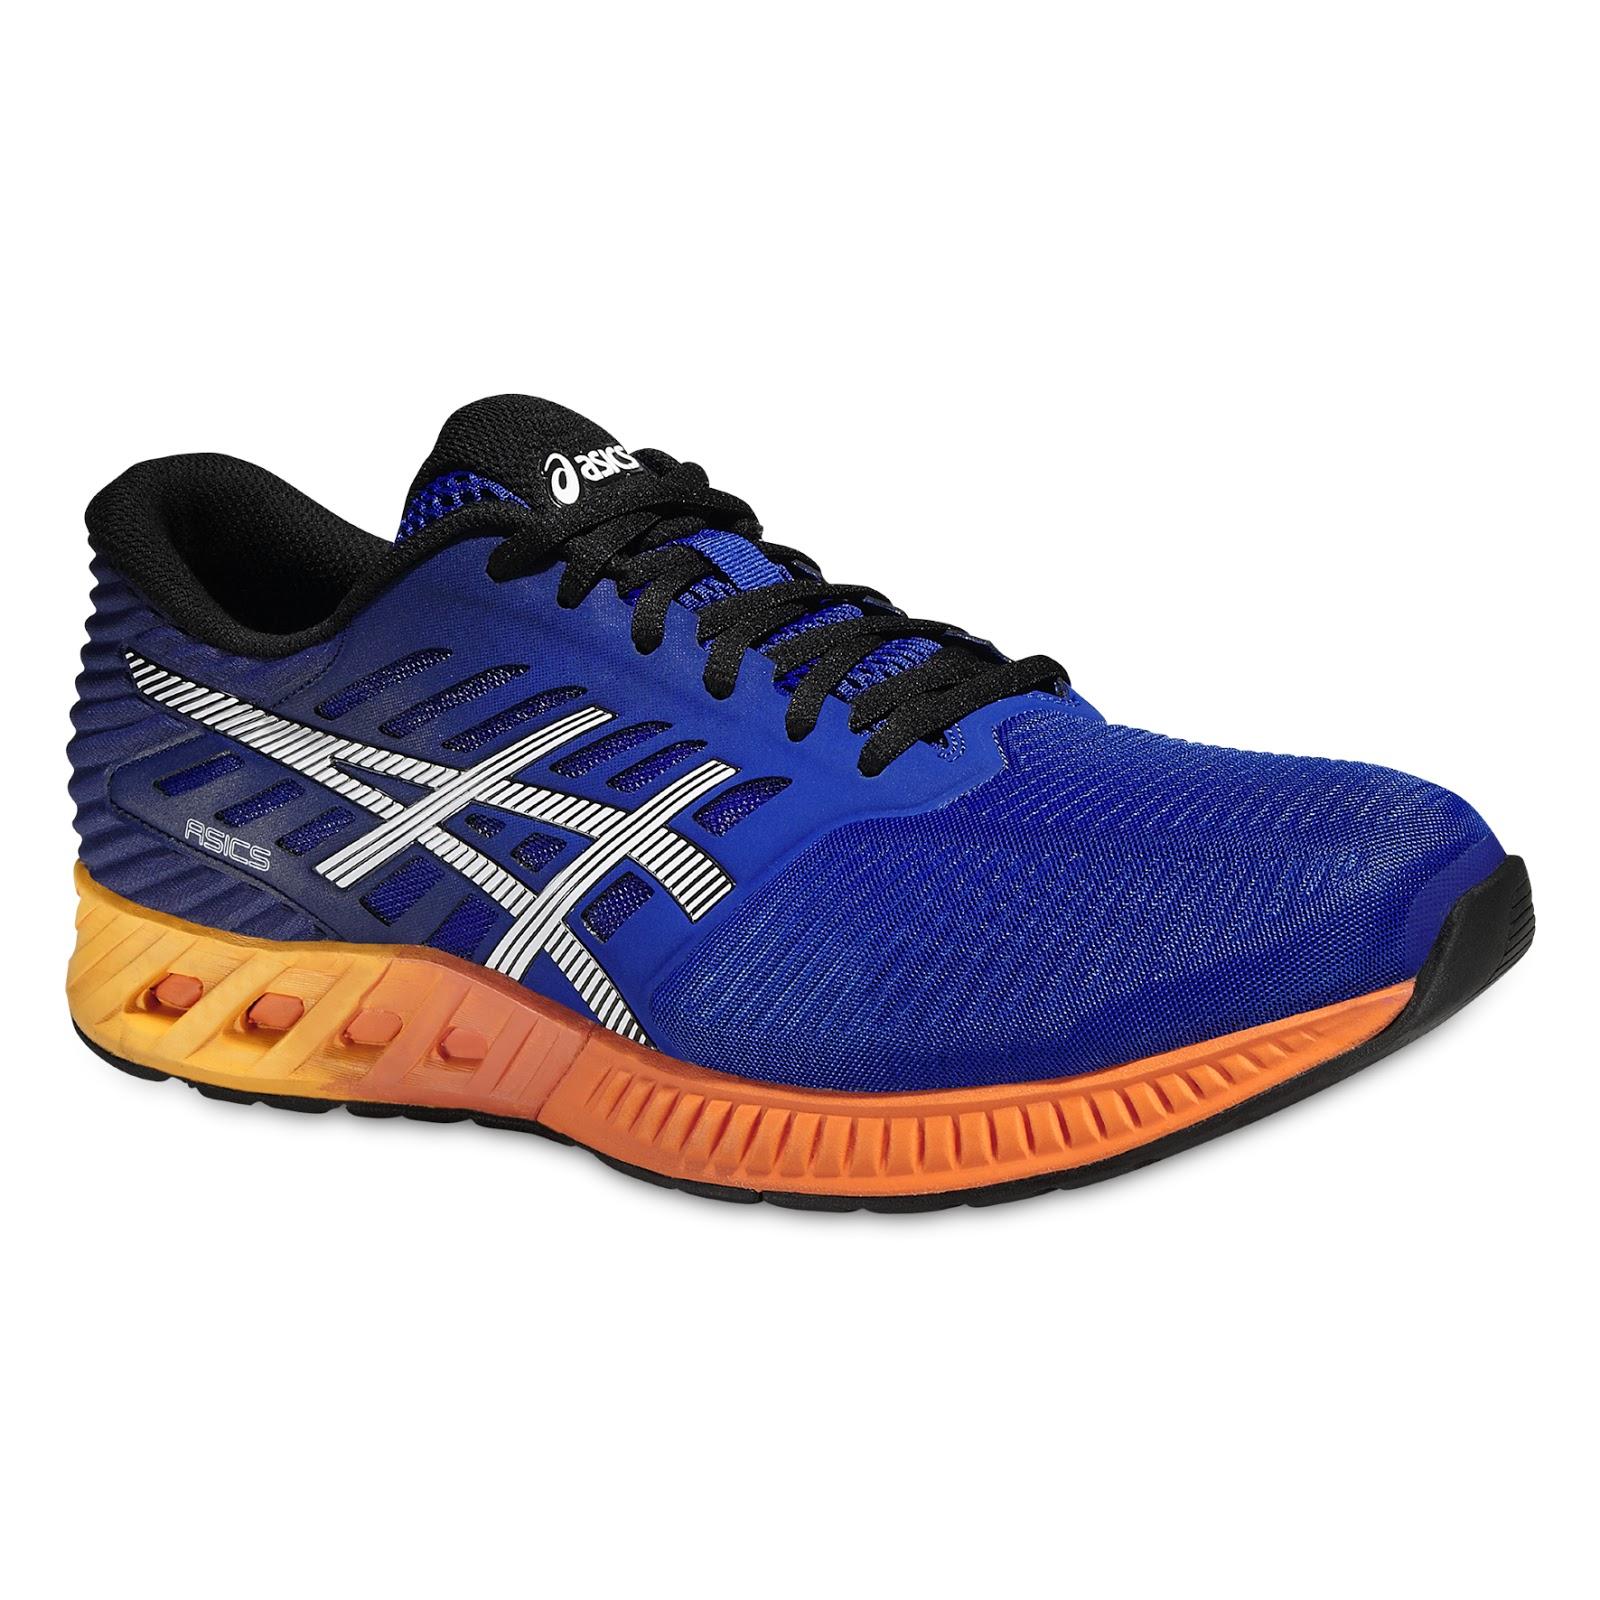 Asics Men S Gel Excite  Running Shoes Blue Silver Black